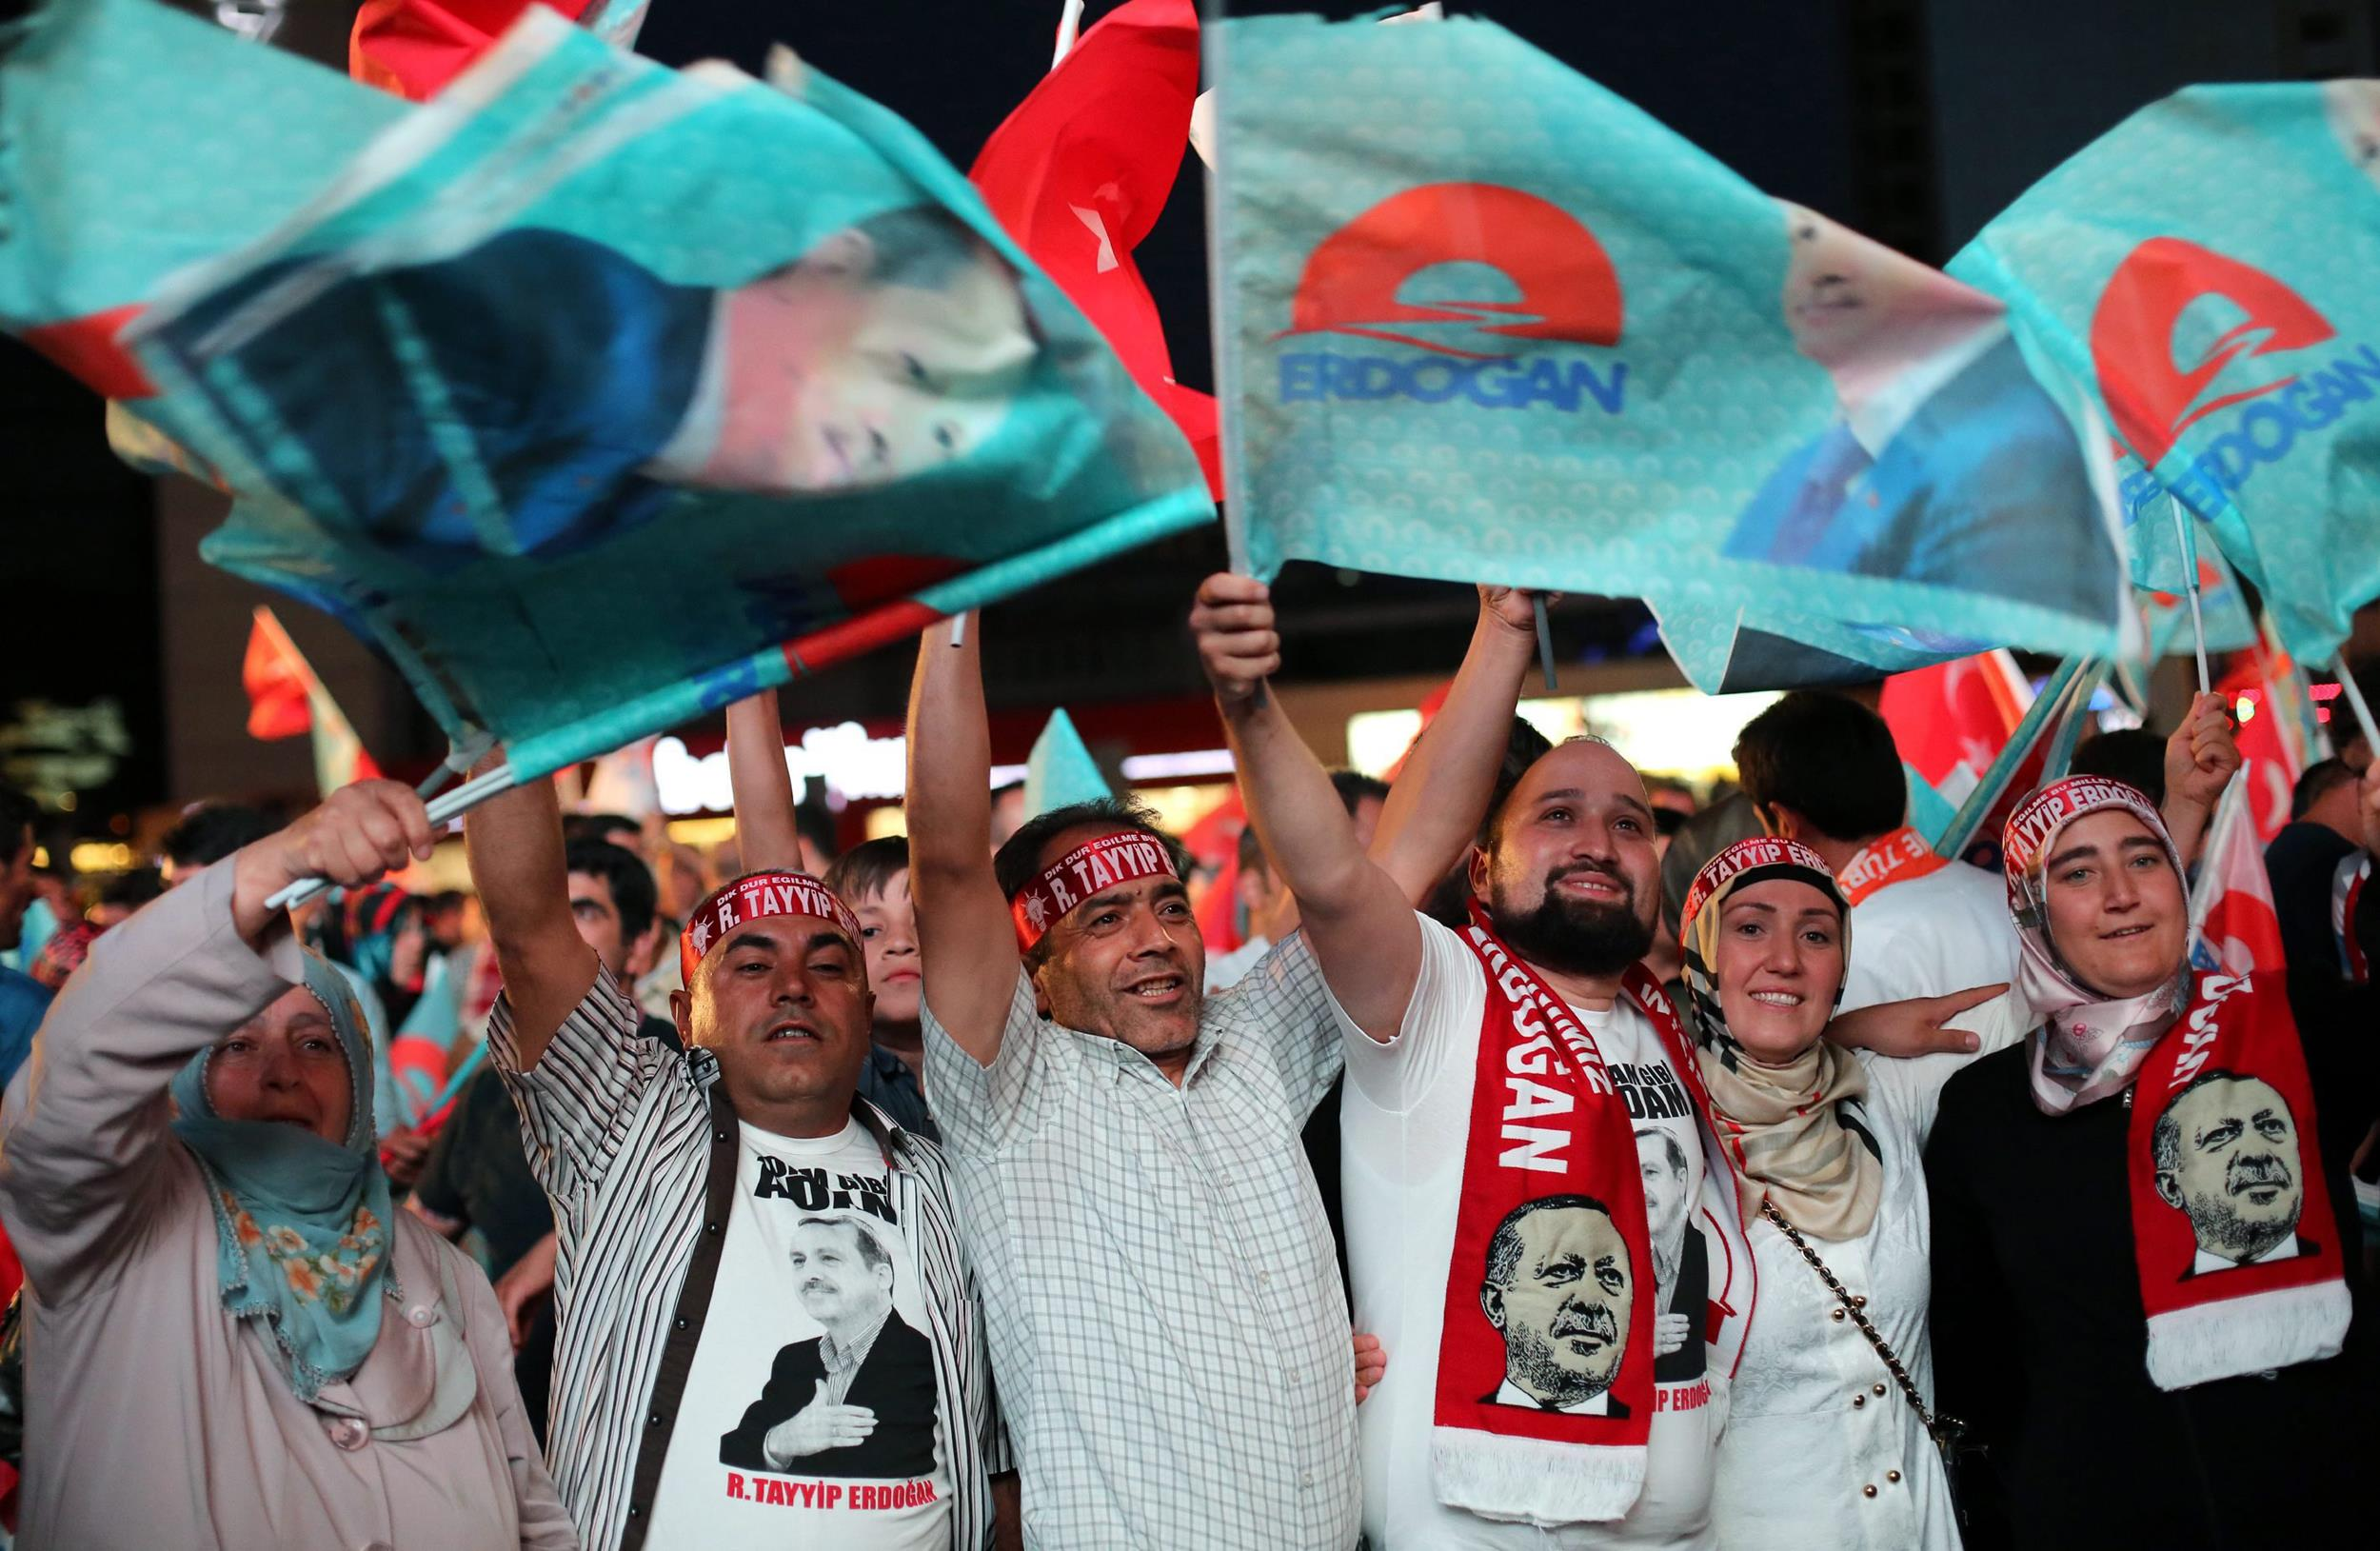 Image: Presidental electons in Turkey